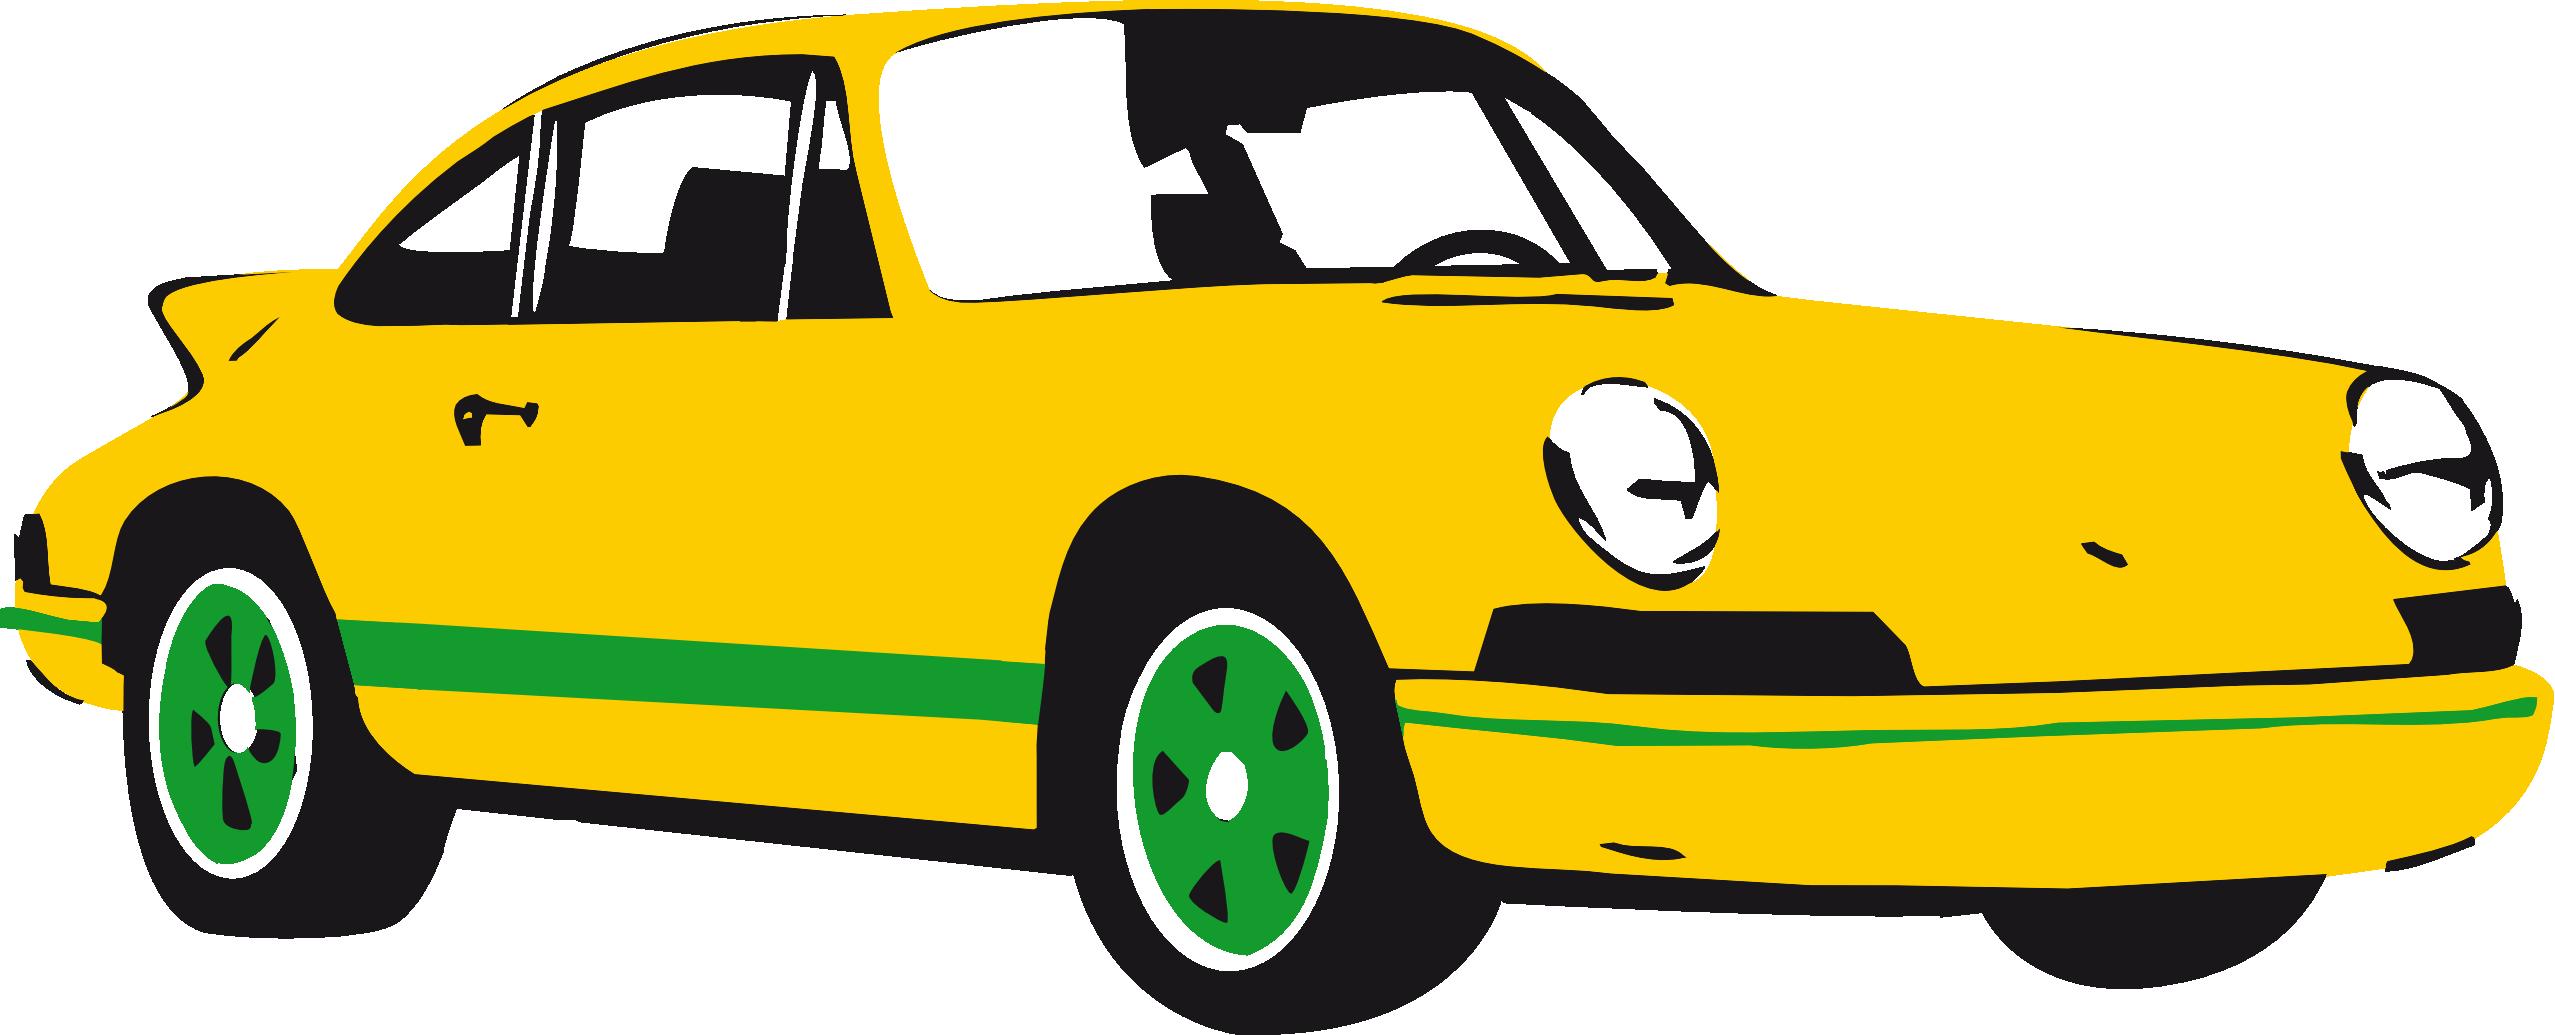 2555x1035 Porsche Sports Car Clip Art Free